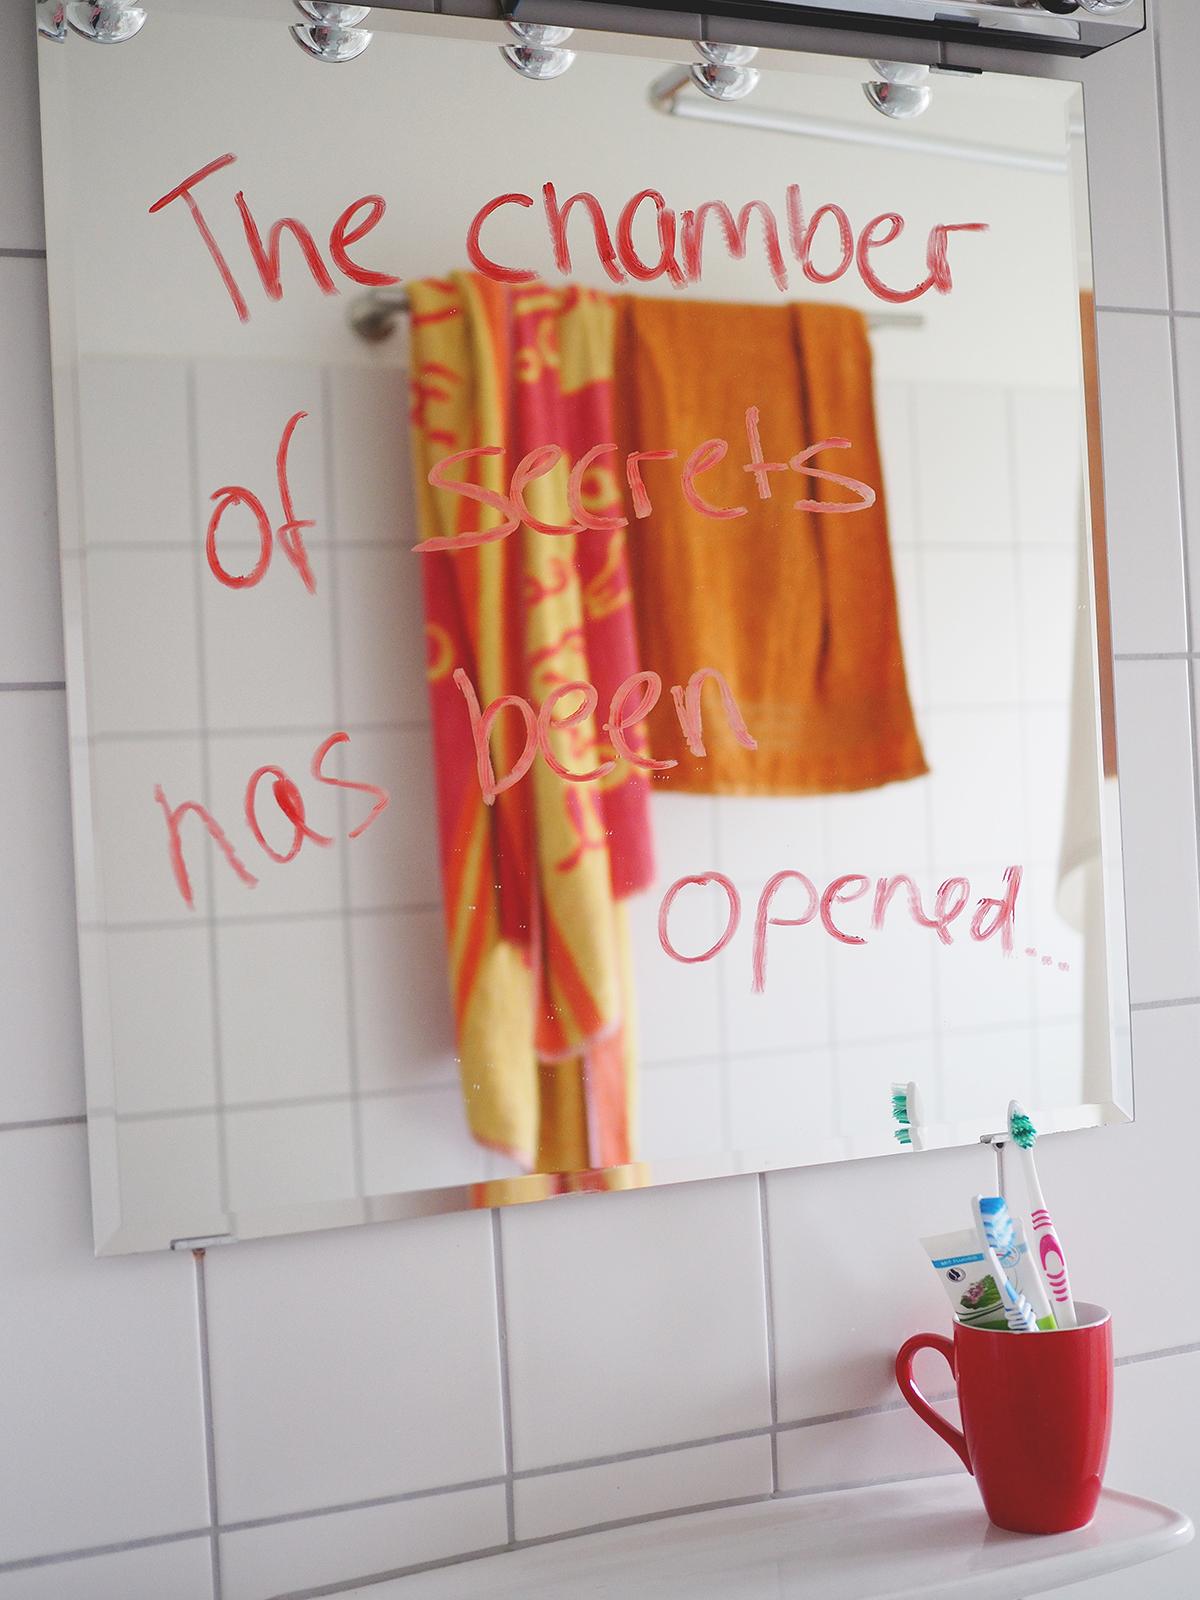 Harry Potter Geburtstag Party chamber of secrets